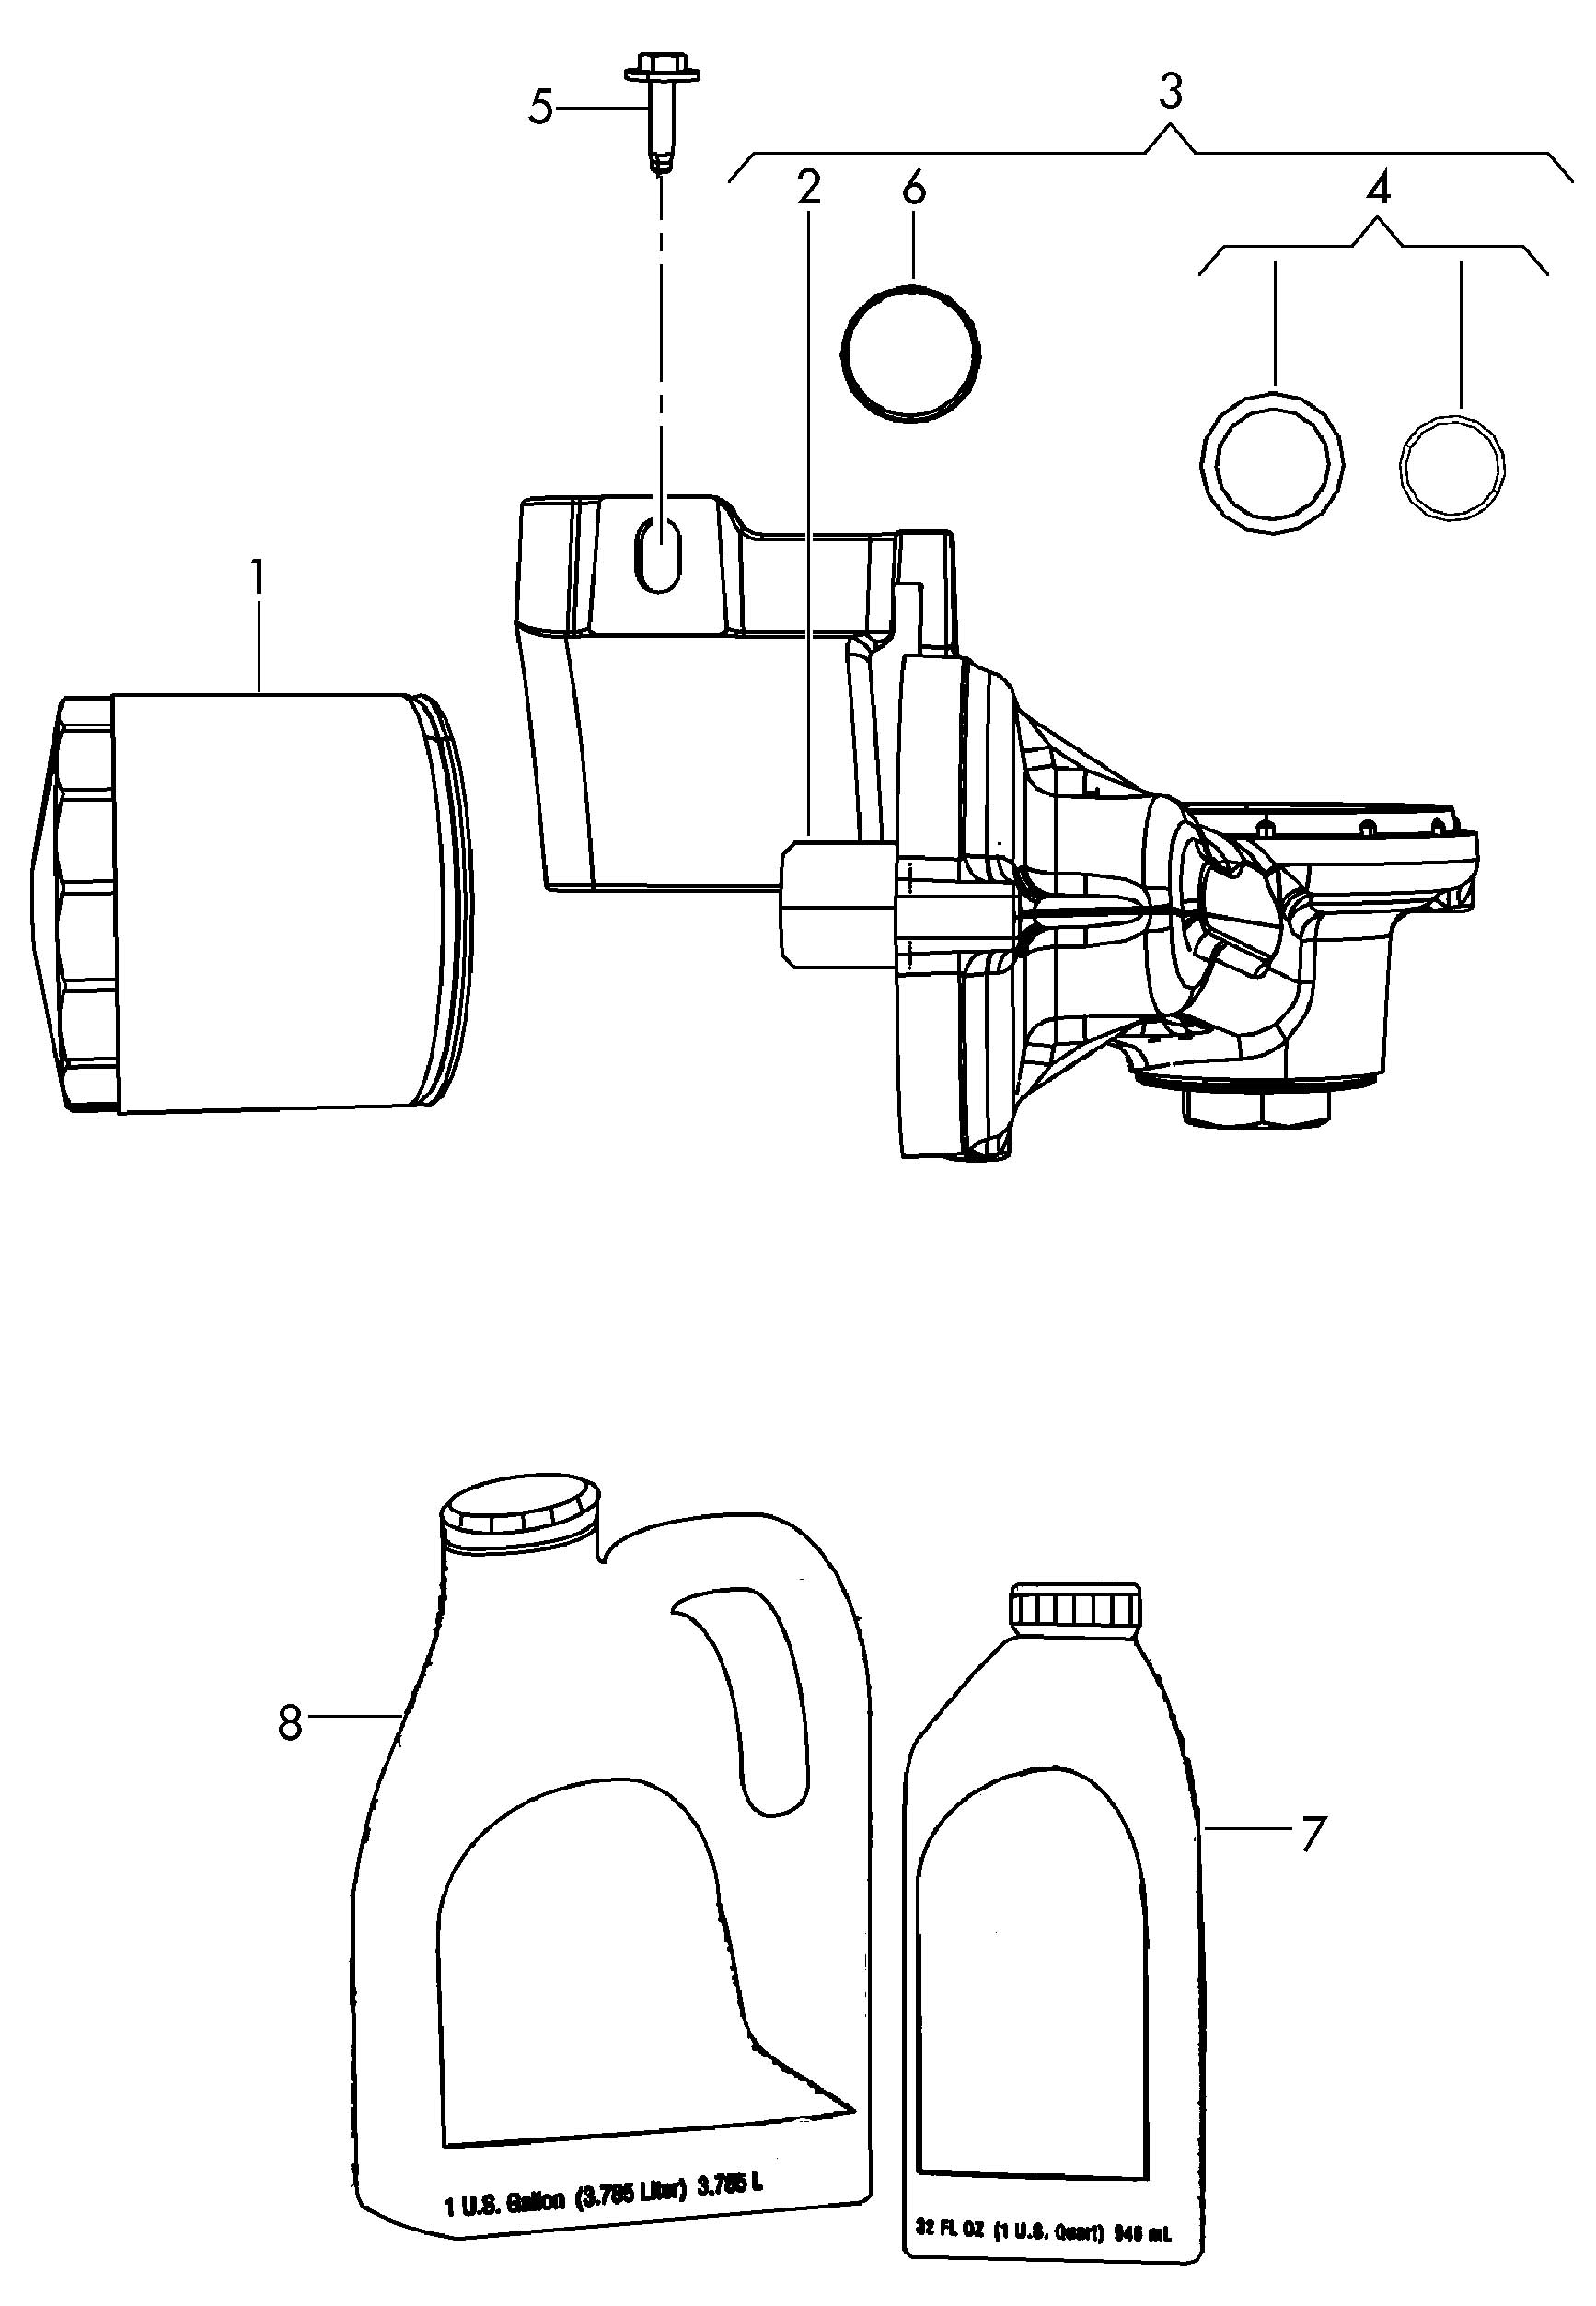 Volkswagen Routan Oil Filter Adapter Oil Filter Bracket